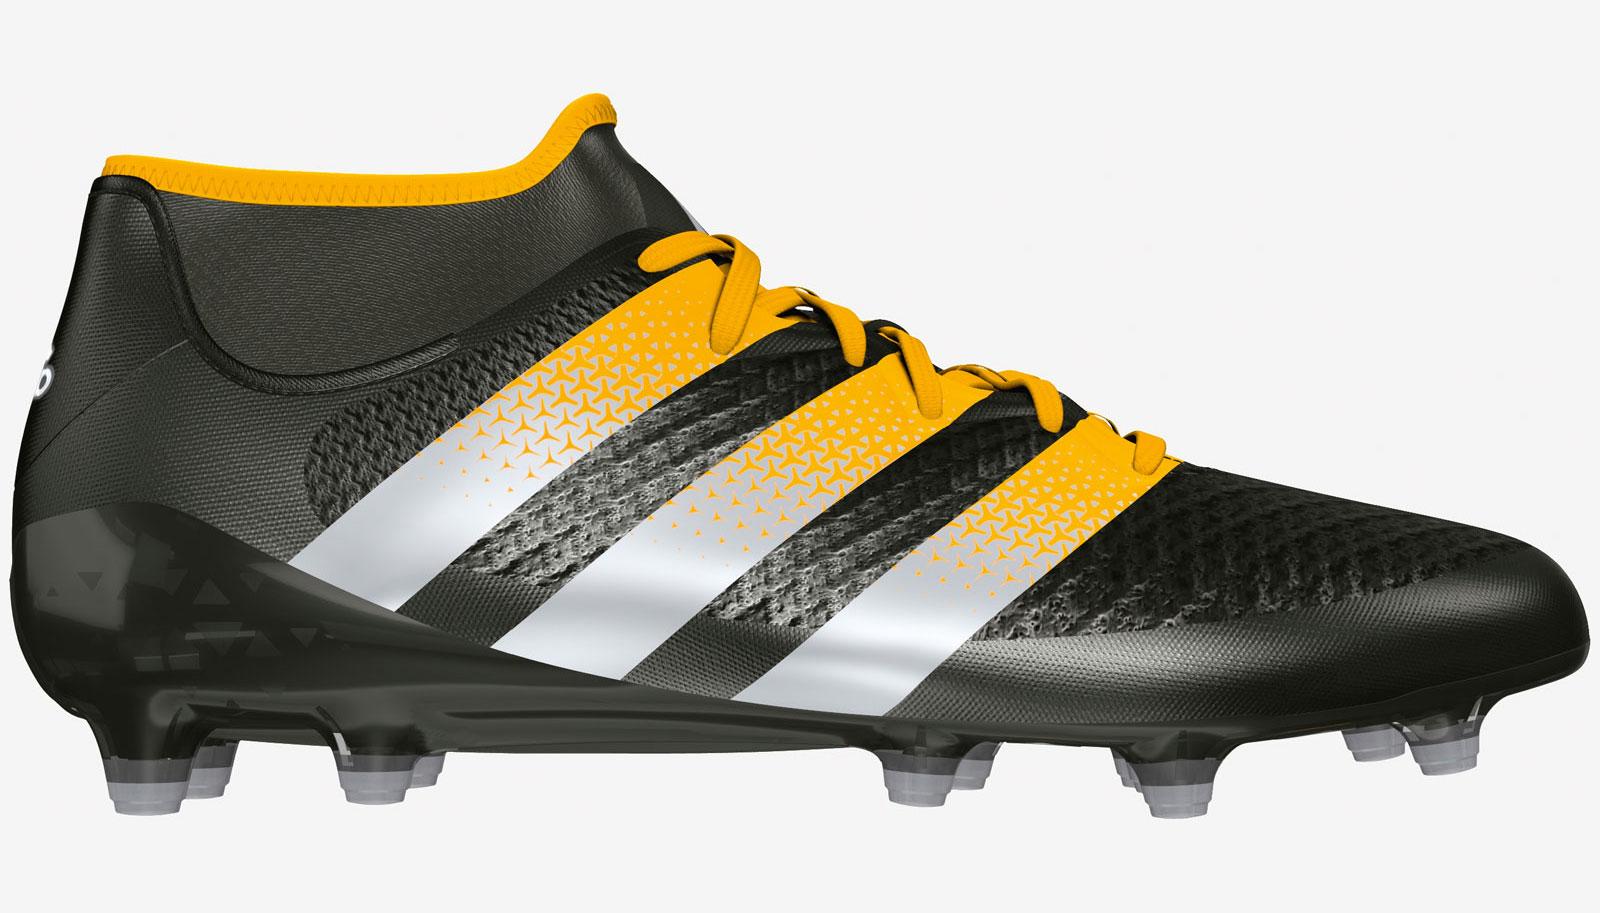 New Nike Football Boots Kids